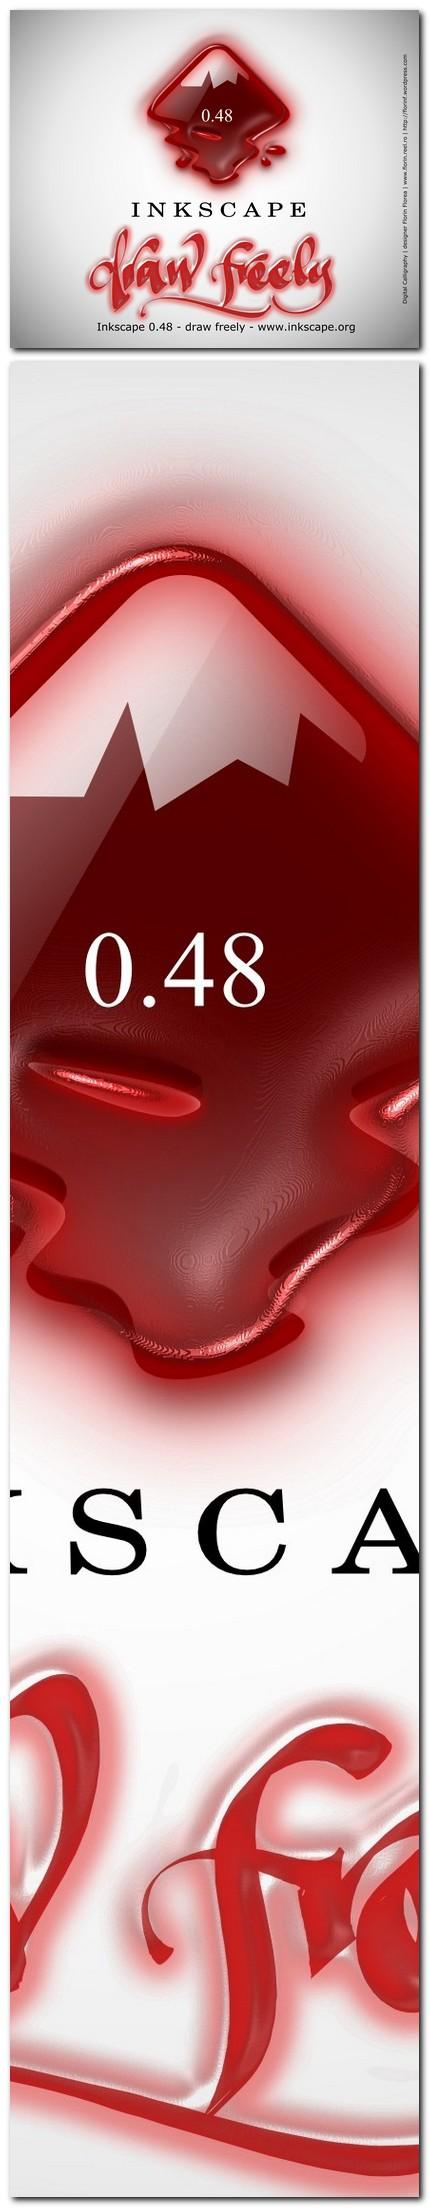 "09 ecran ""About Inkscape"" varianta netrimisa - florinf"